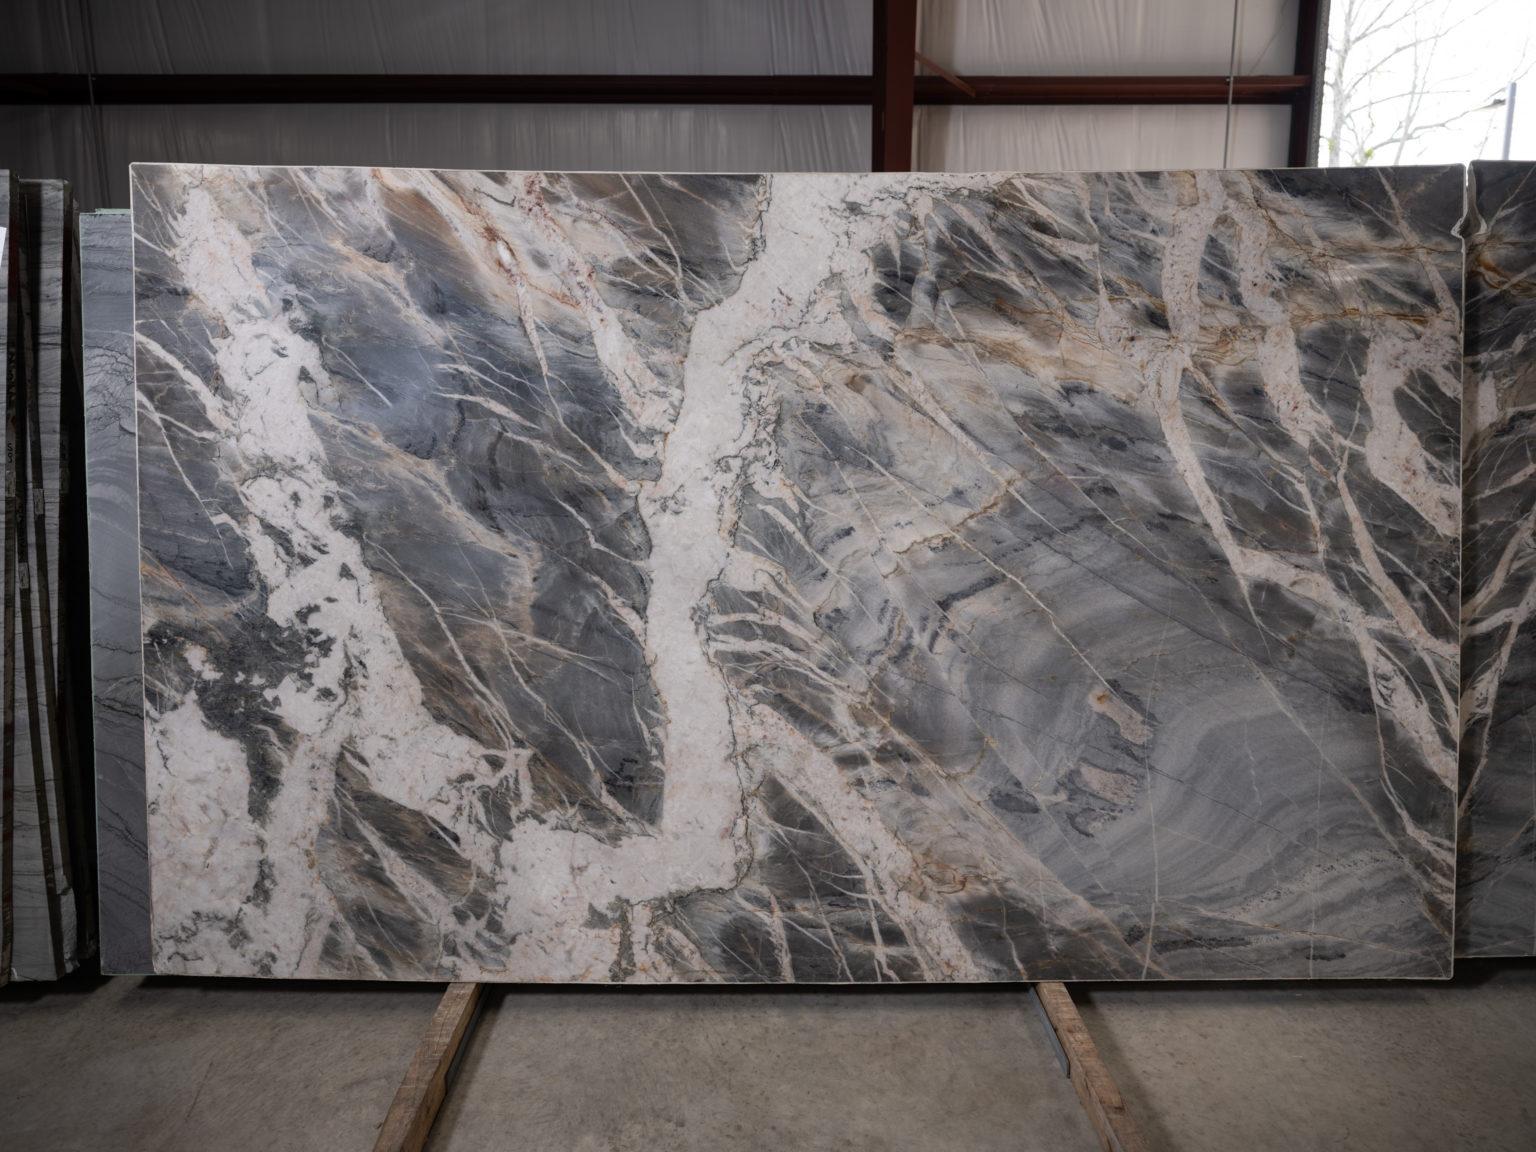 stone_basyx-20200221-DSCF9348